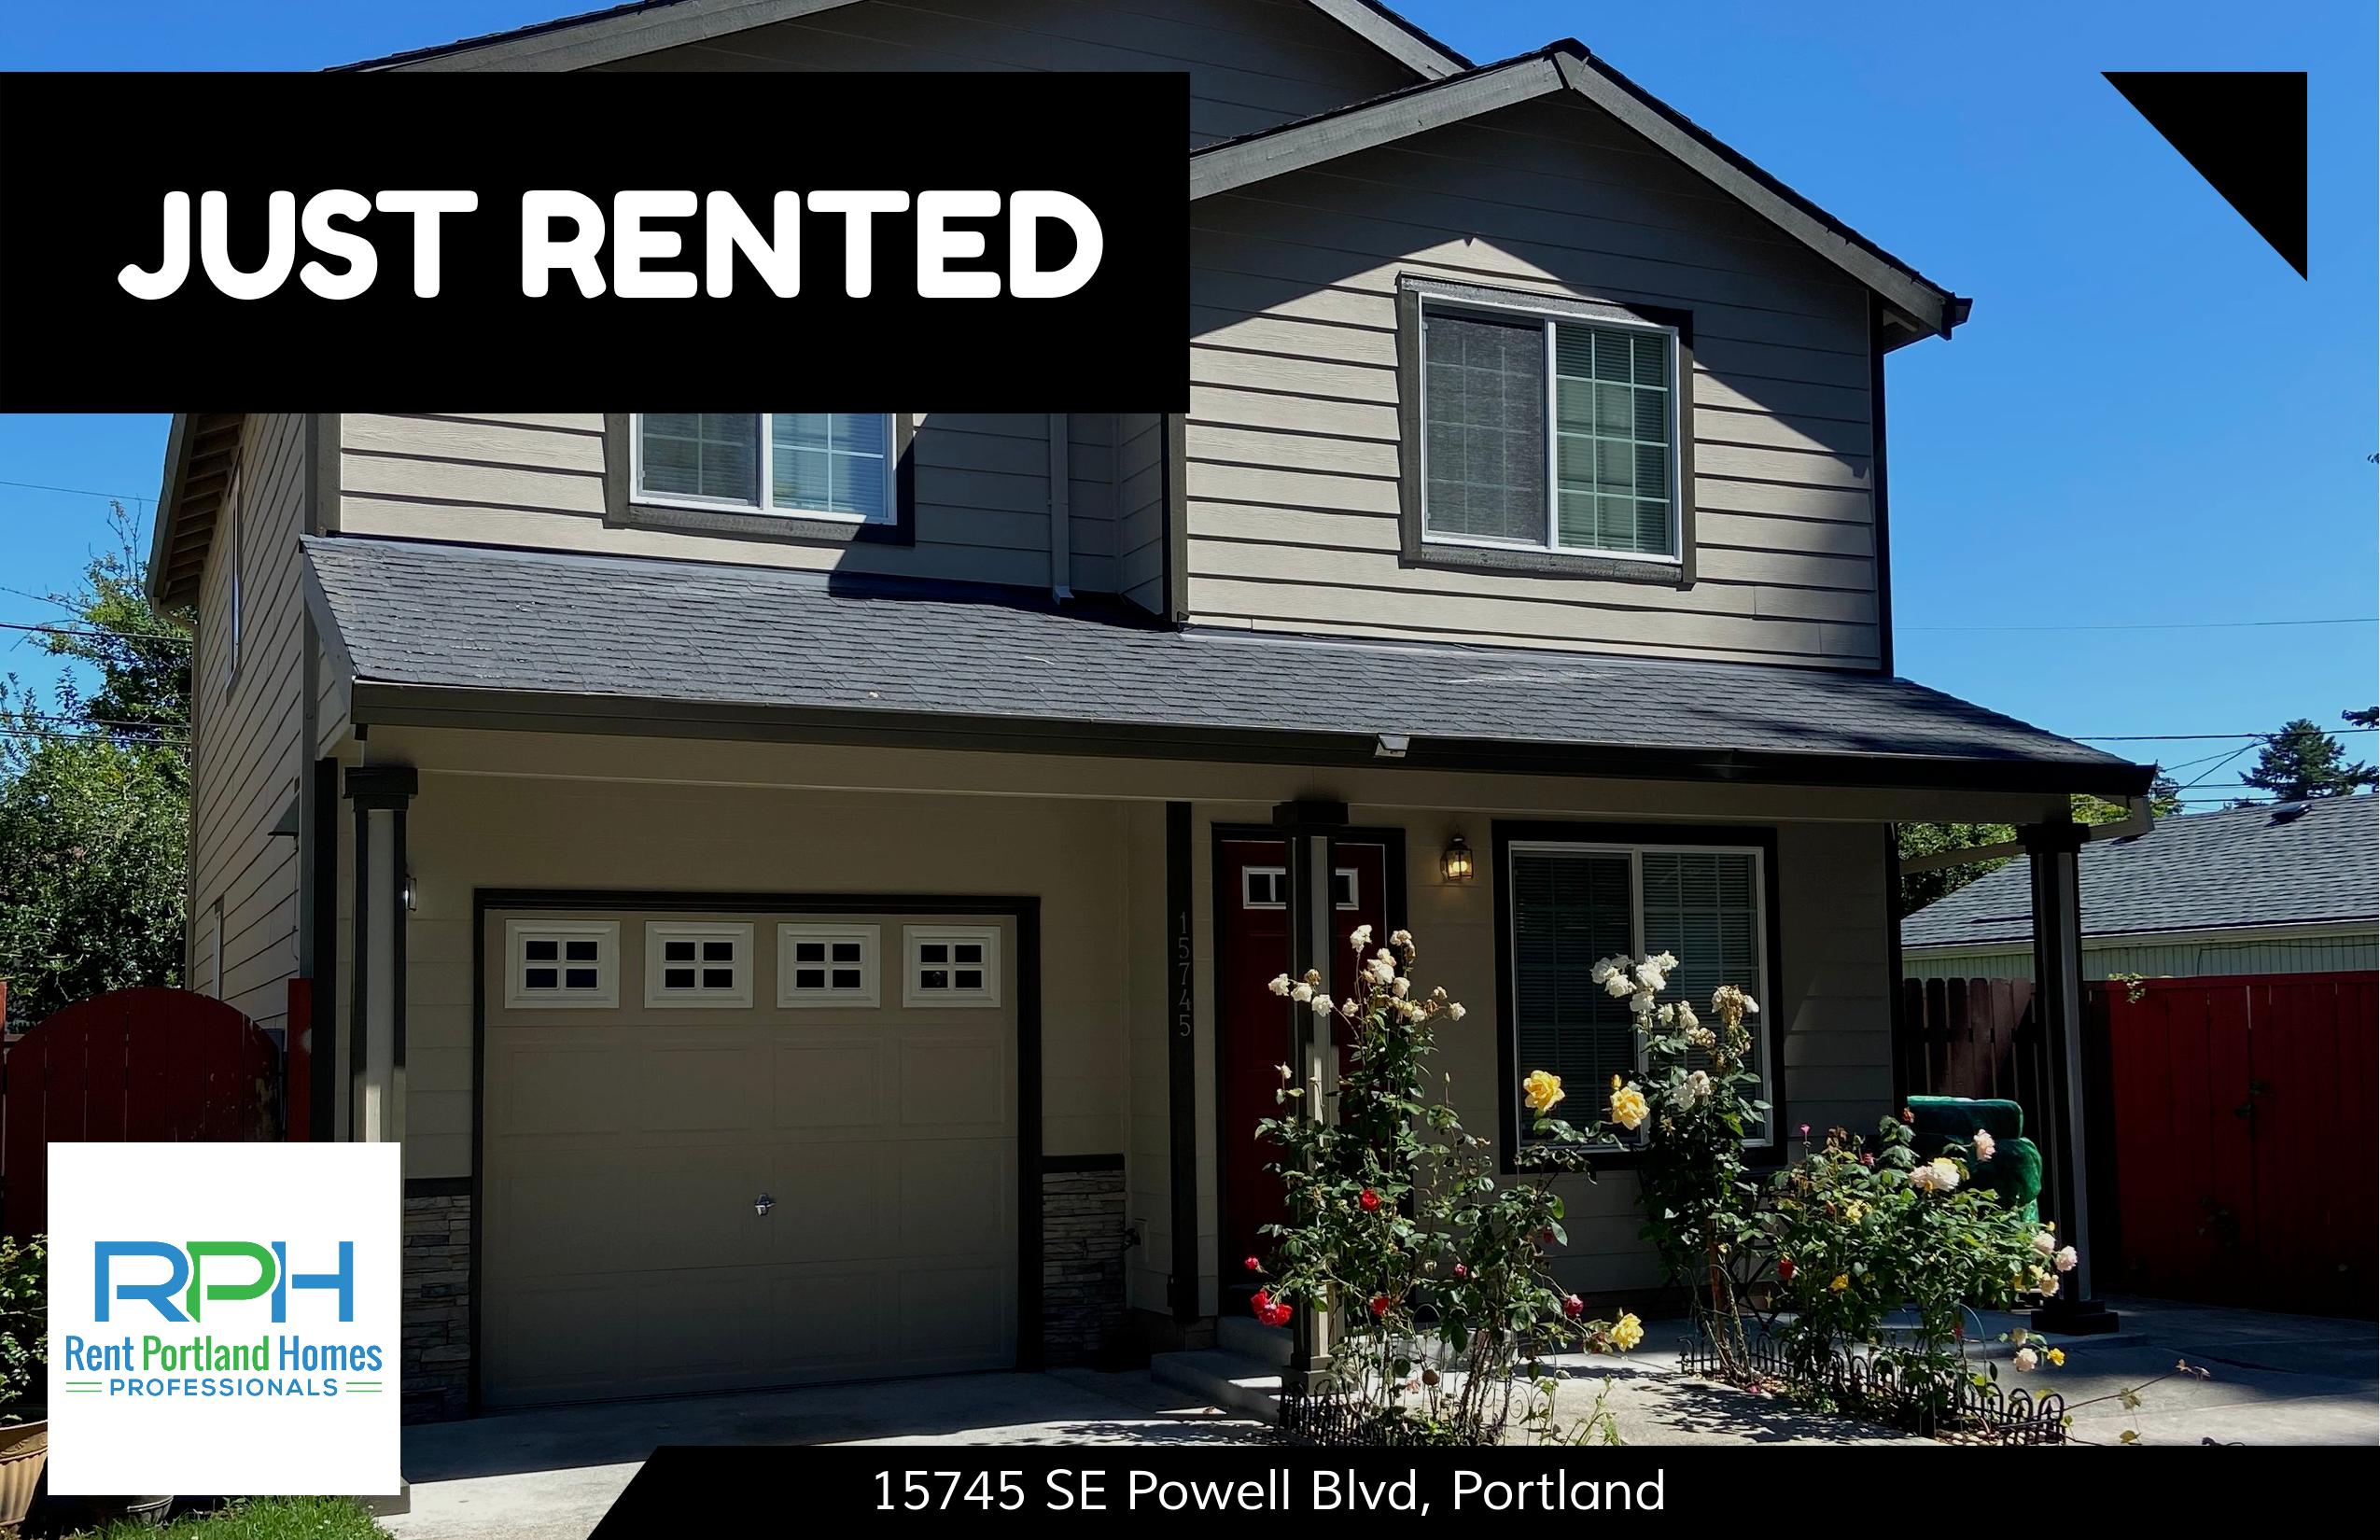 15745 SE Powell Blvd, Portland - JUST RENTED